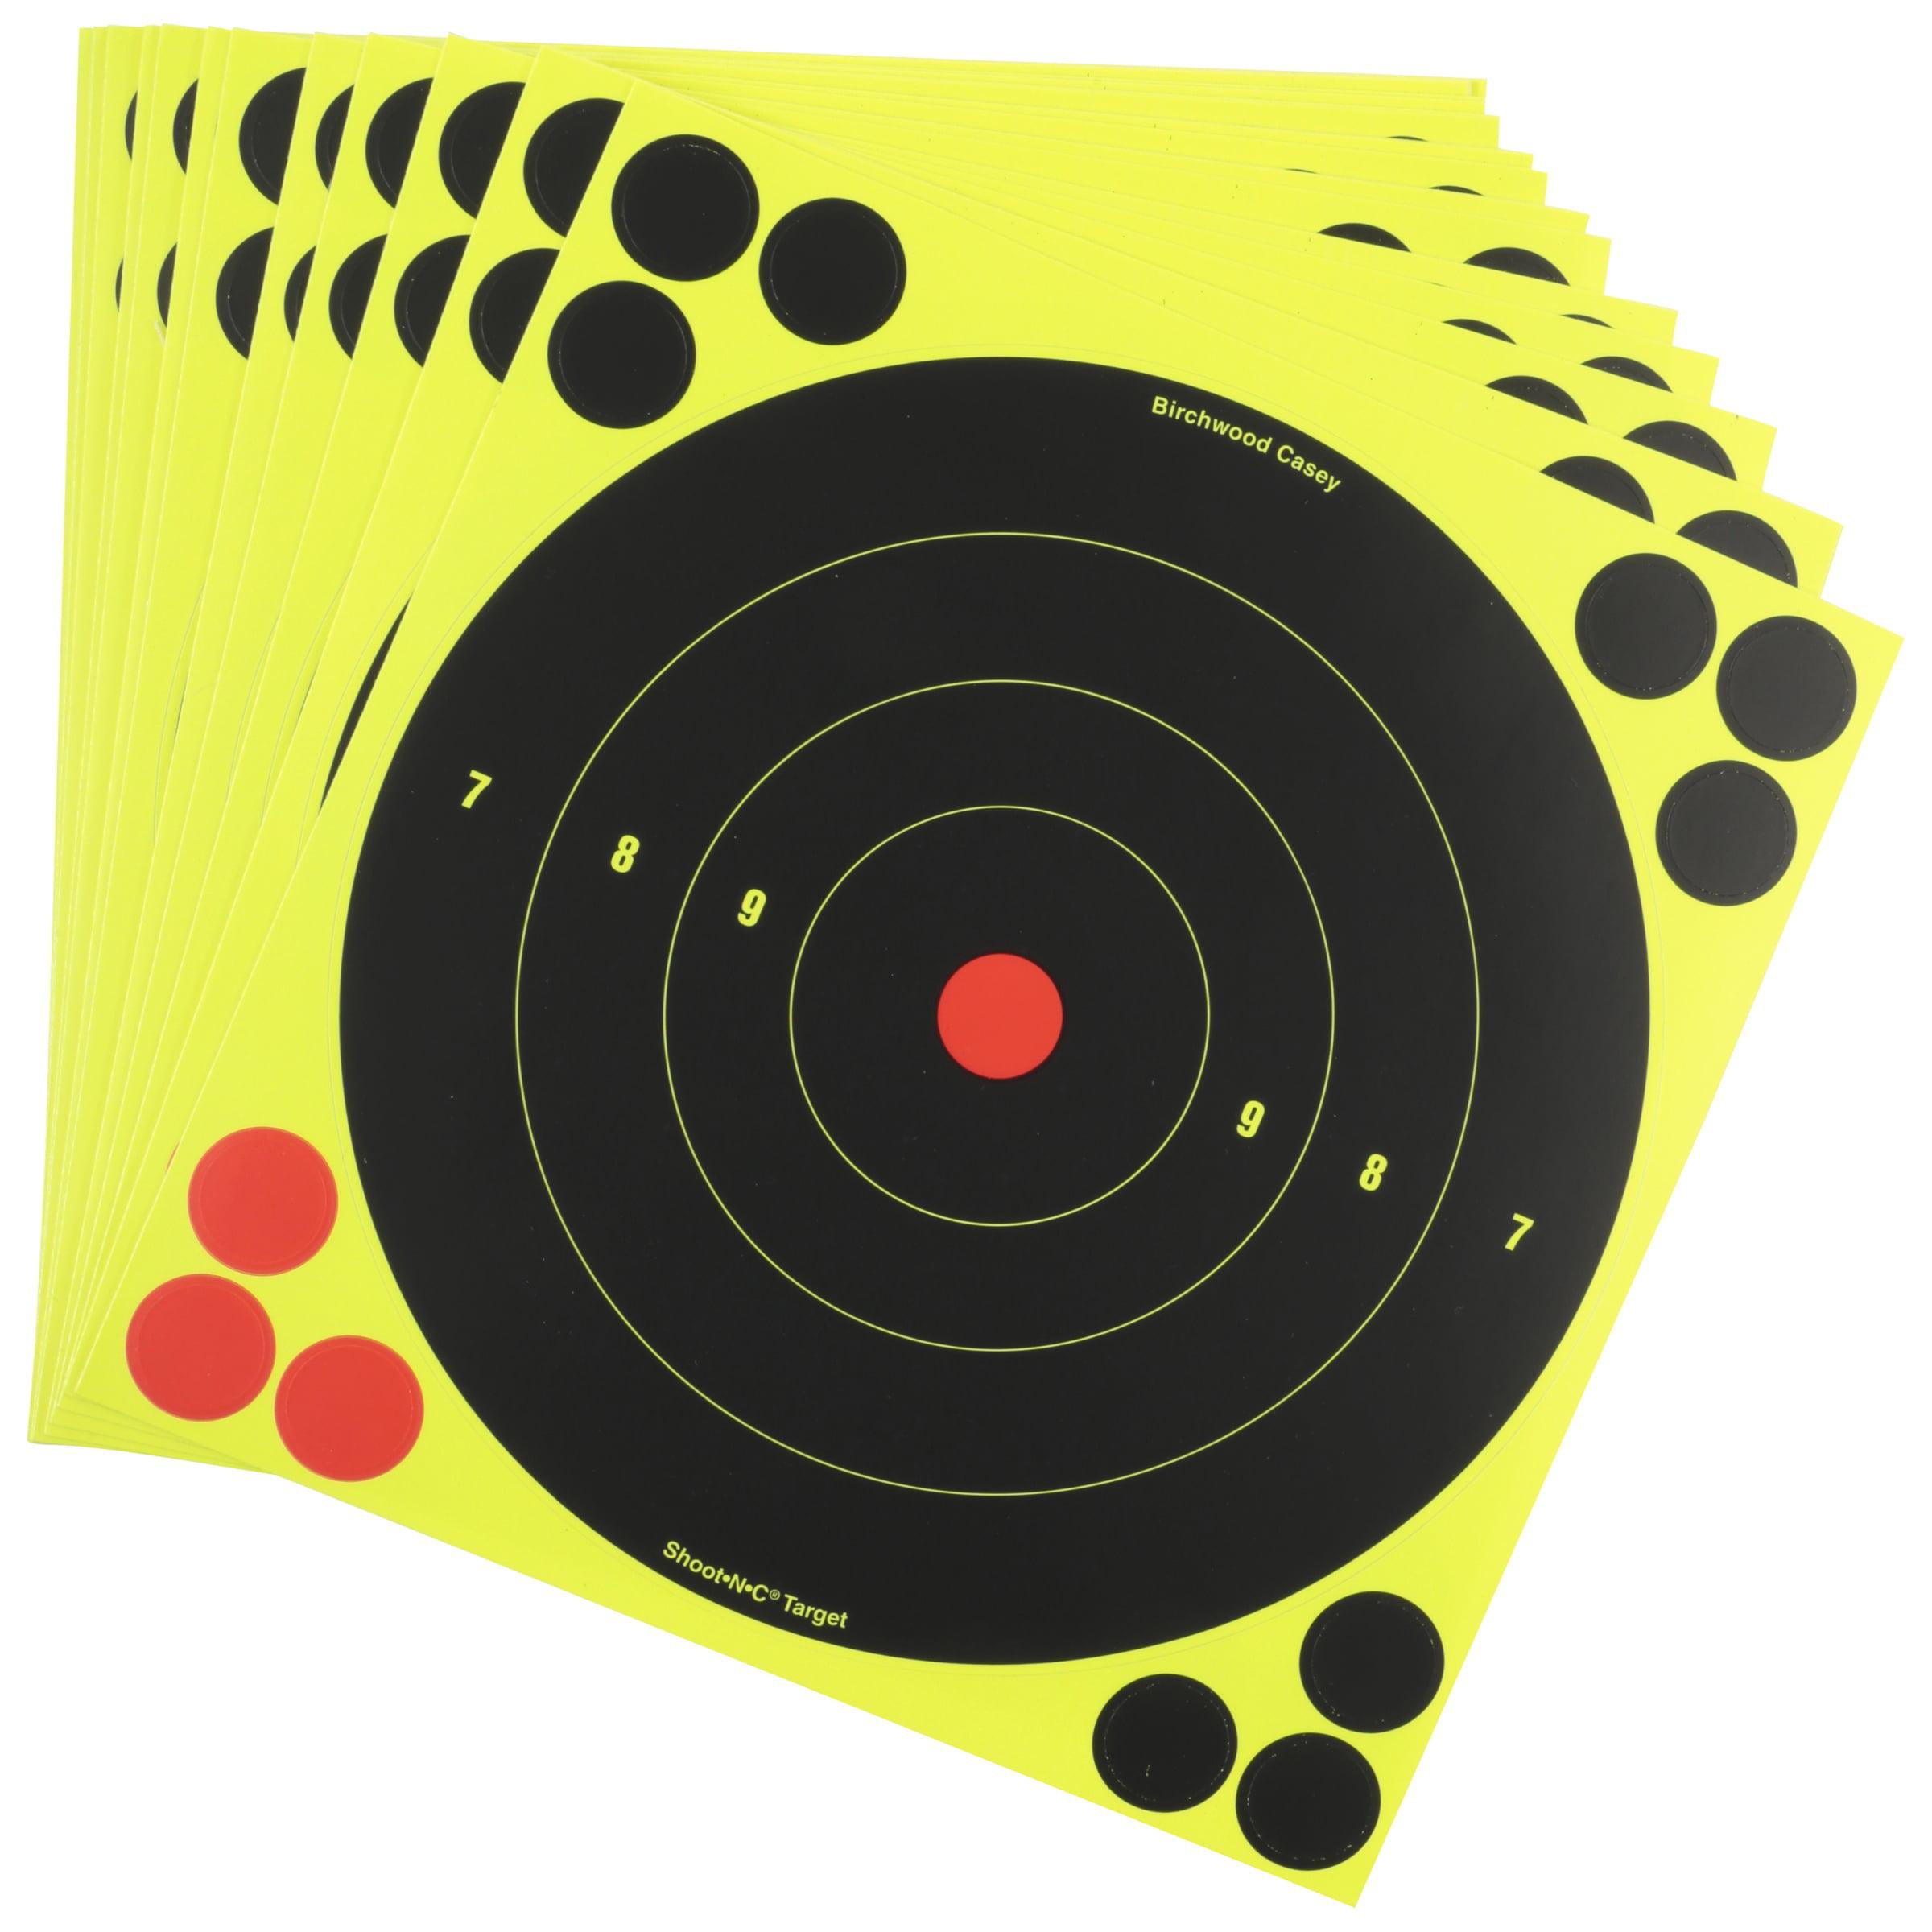 "Birchwood Casey Shoot-N-C Self Adhesive Bull's Eye 8"" Target, 30 Sheets Per Pack"